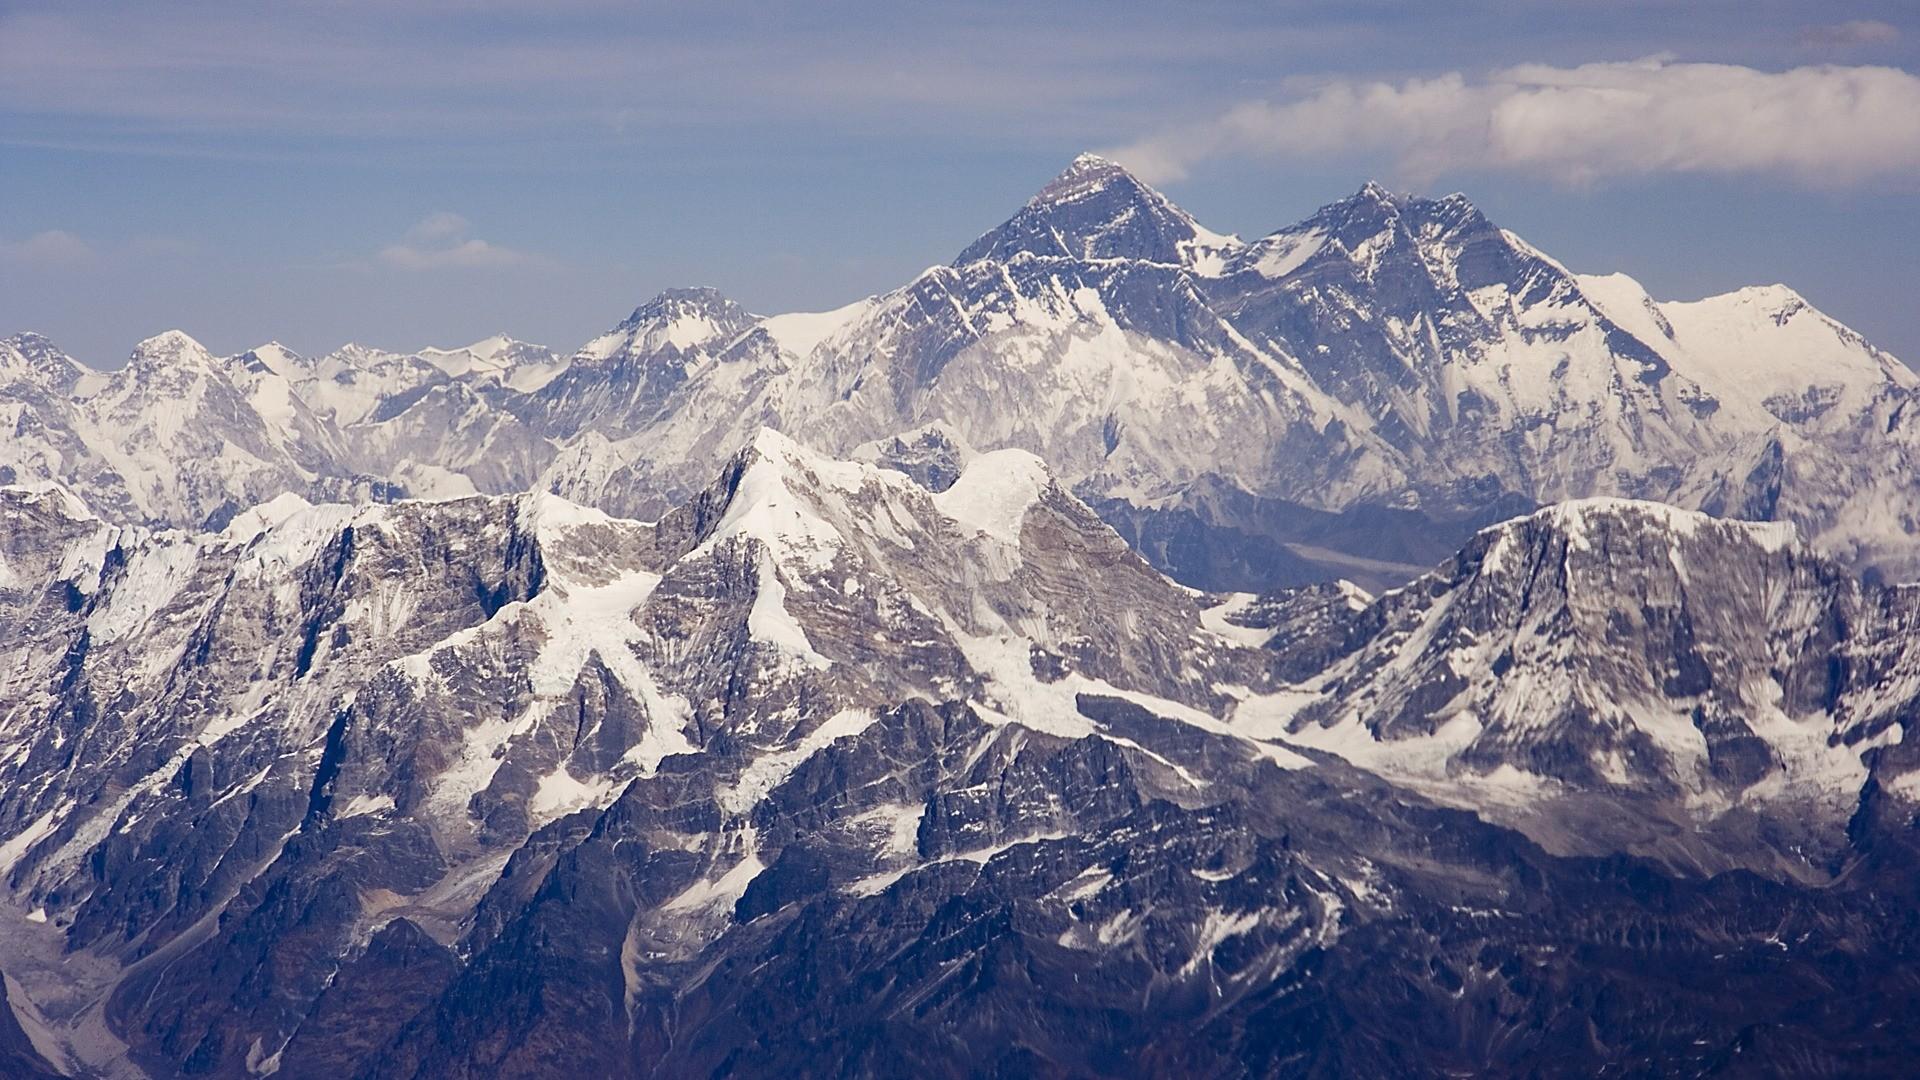 Mount Everest Wallpaper Landscape Nature Wallpapers